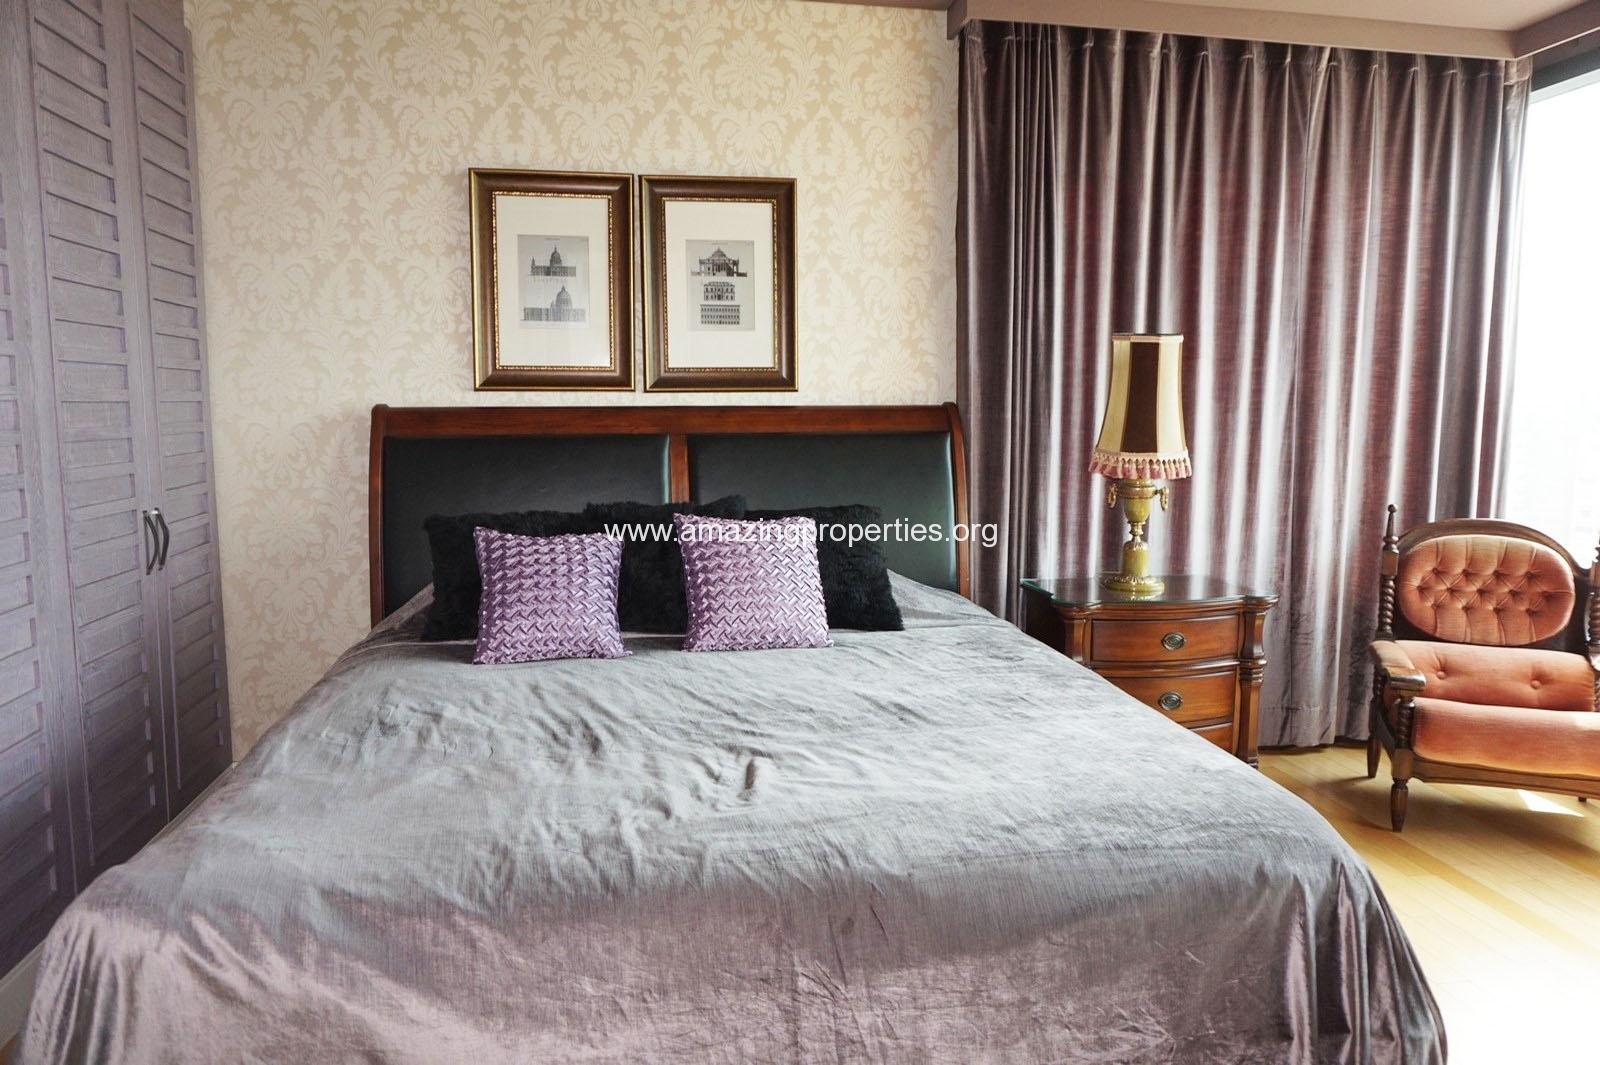 Aguston 3 bedroom-8